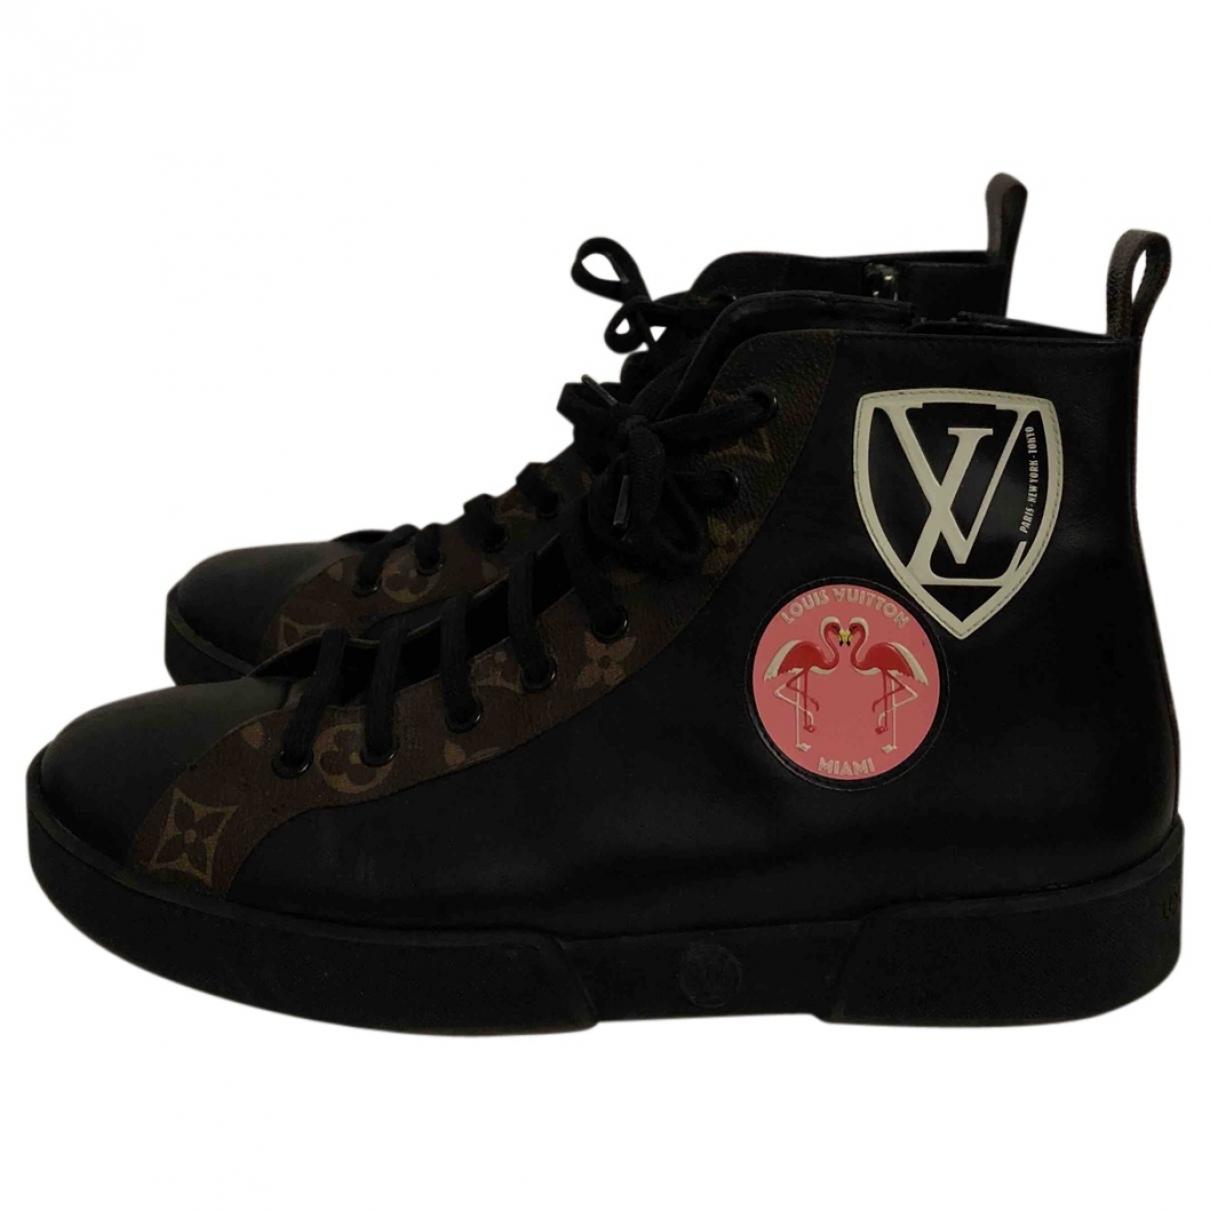 Louis Vuitton Stellar Black Leather Trainers for Women 39 EU